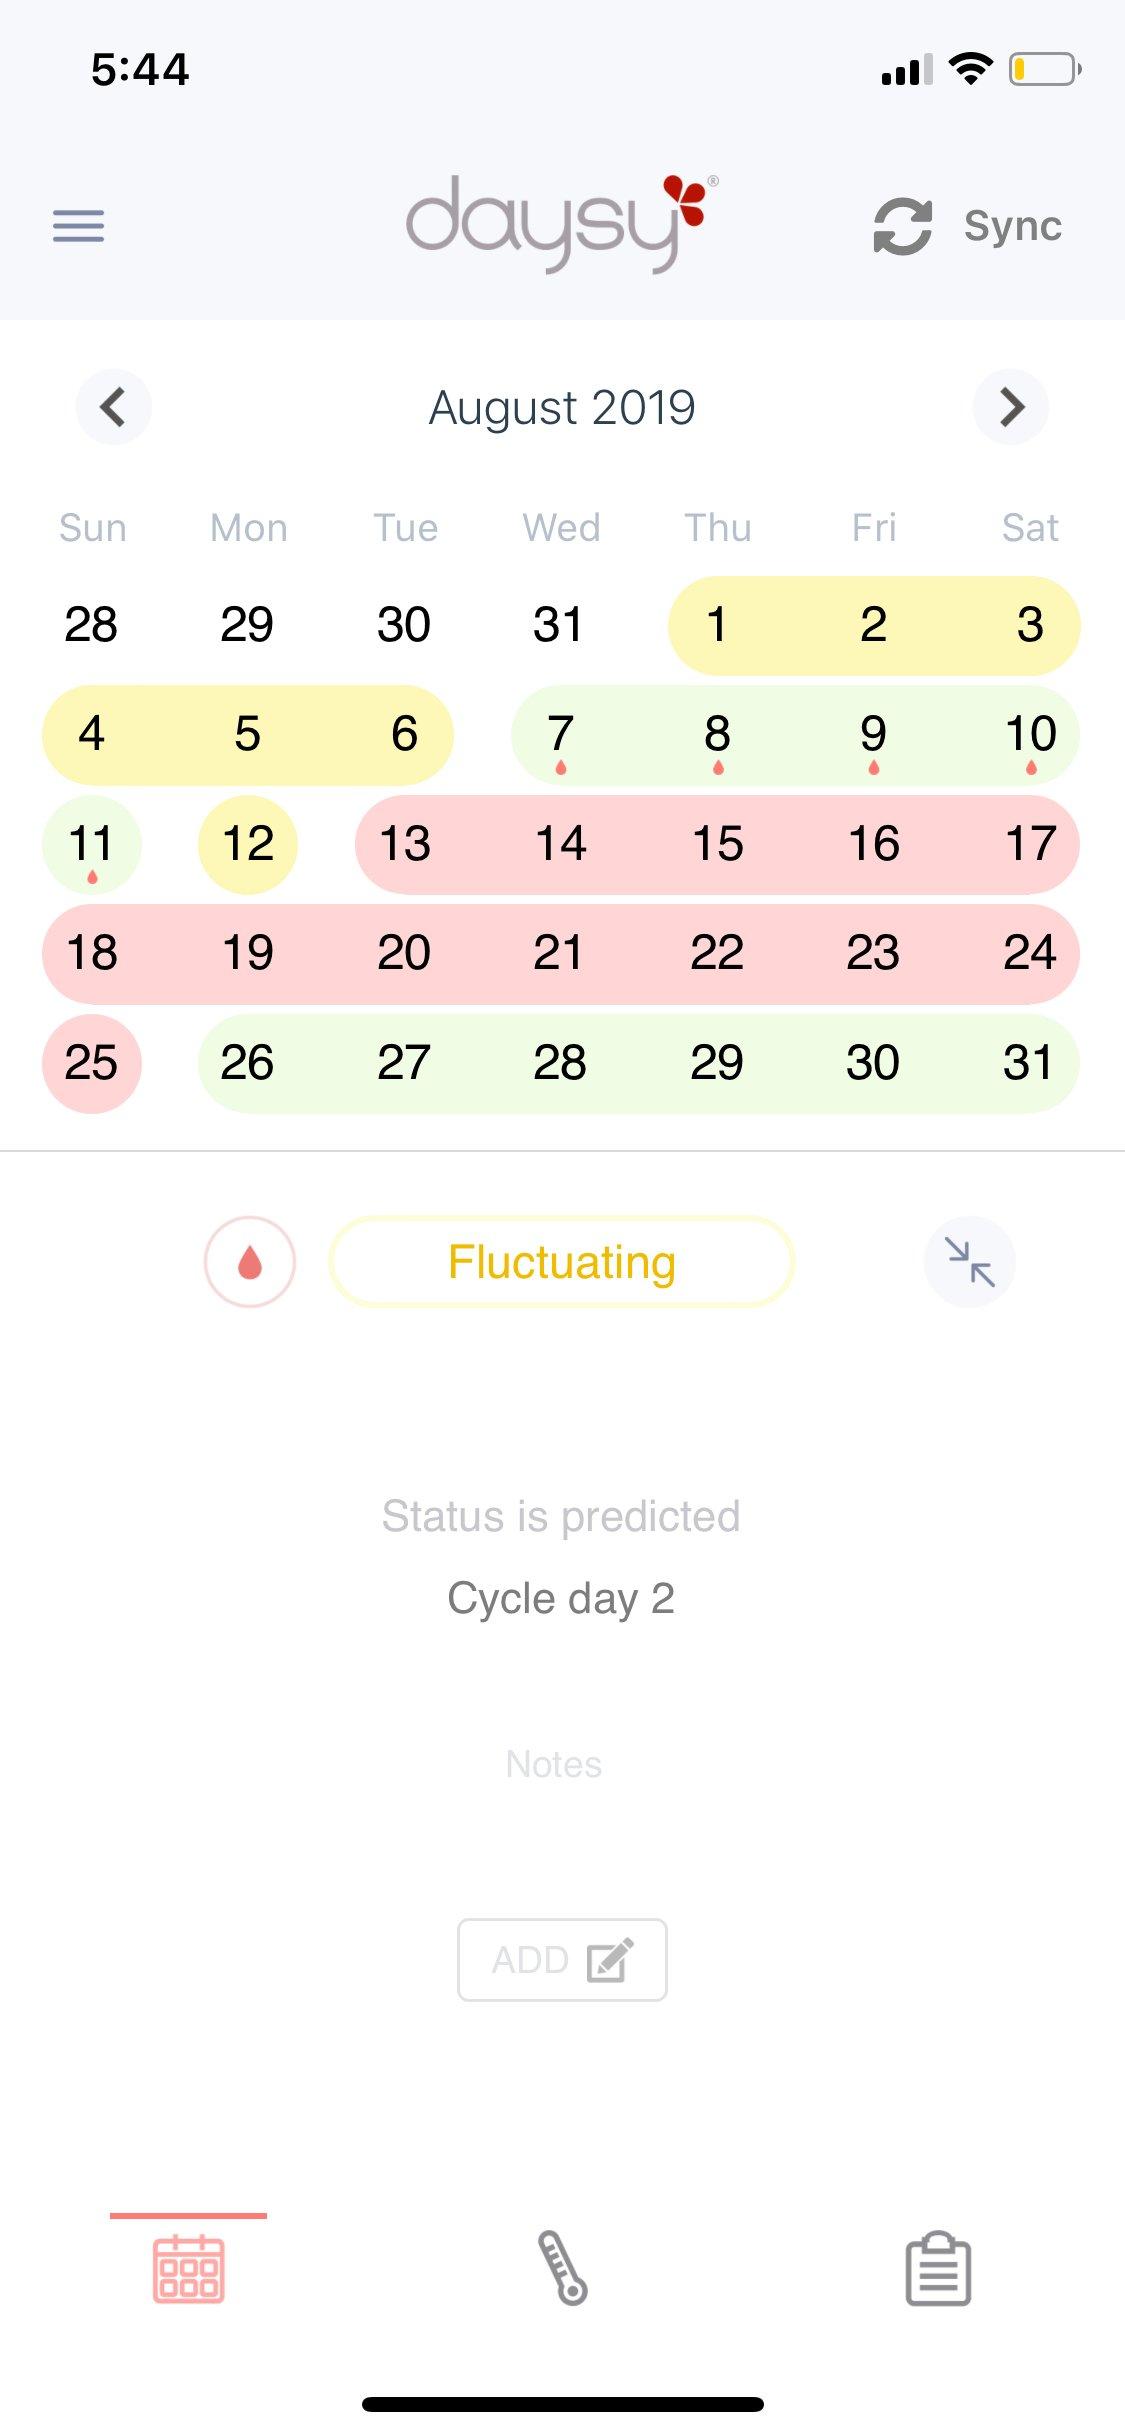 Screenshot of the calendar in the Dasysview app.